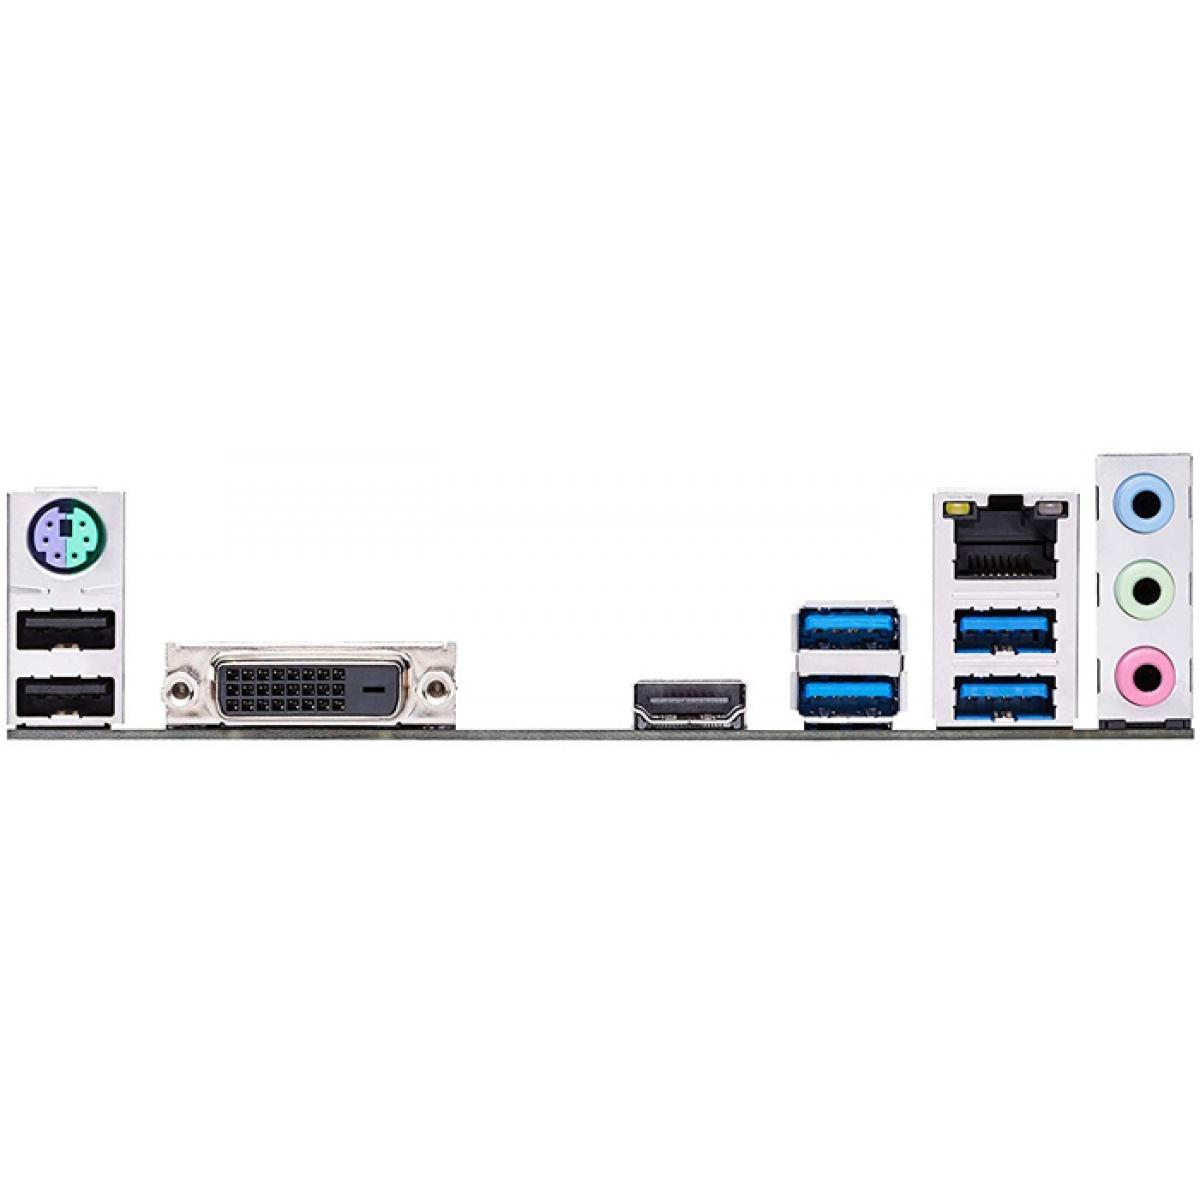 Placa Mãe Asus PRIME Z370-P II, Chipset Z370, Intel LGA 1151, ATX, DDR4